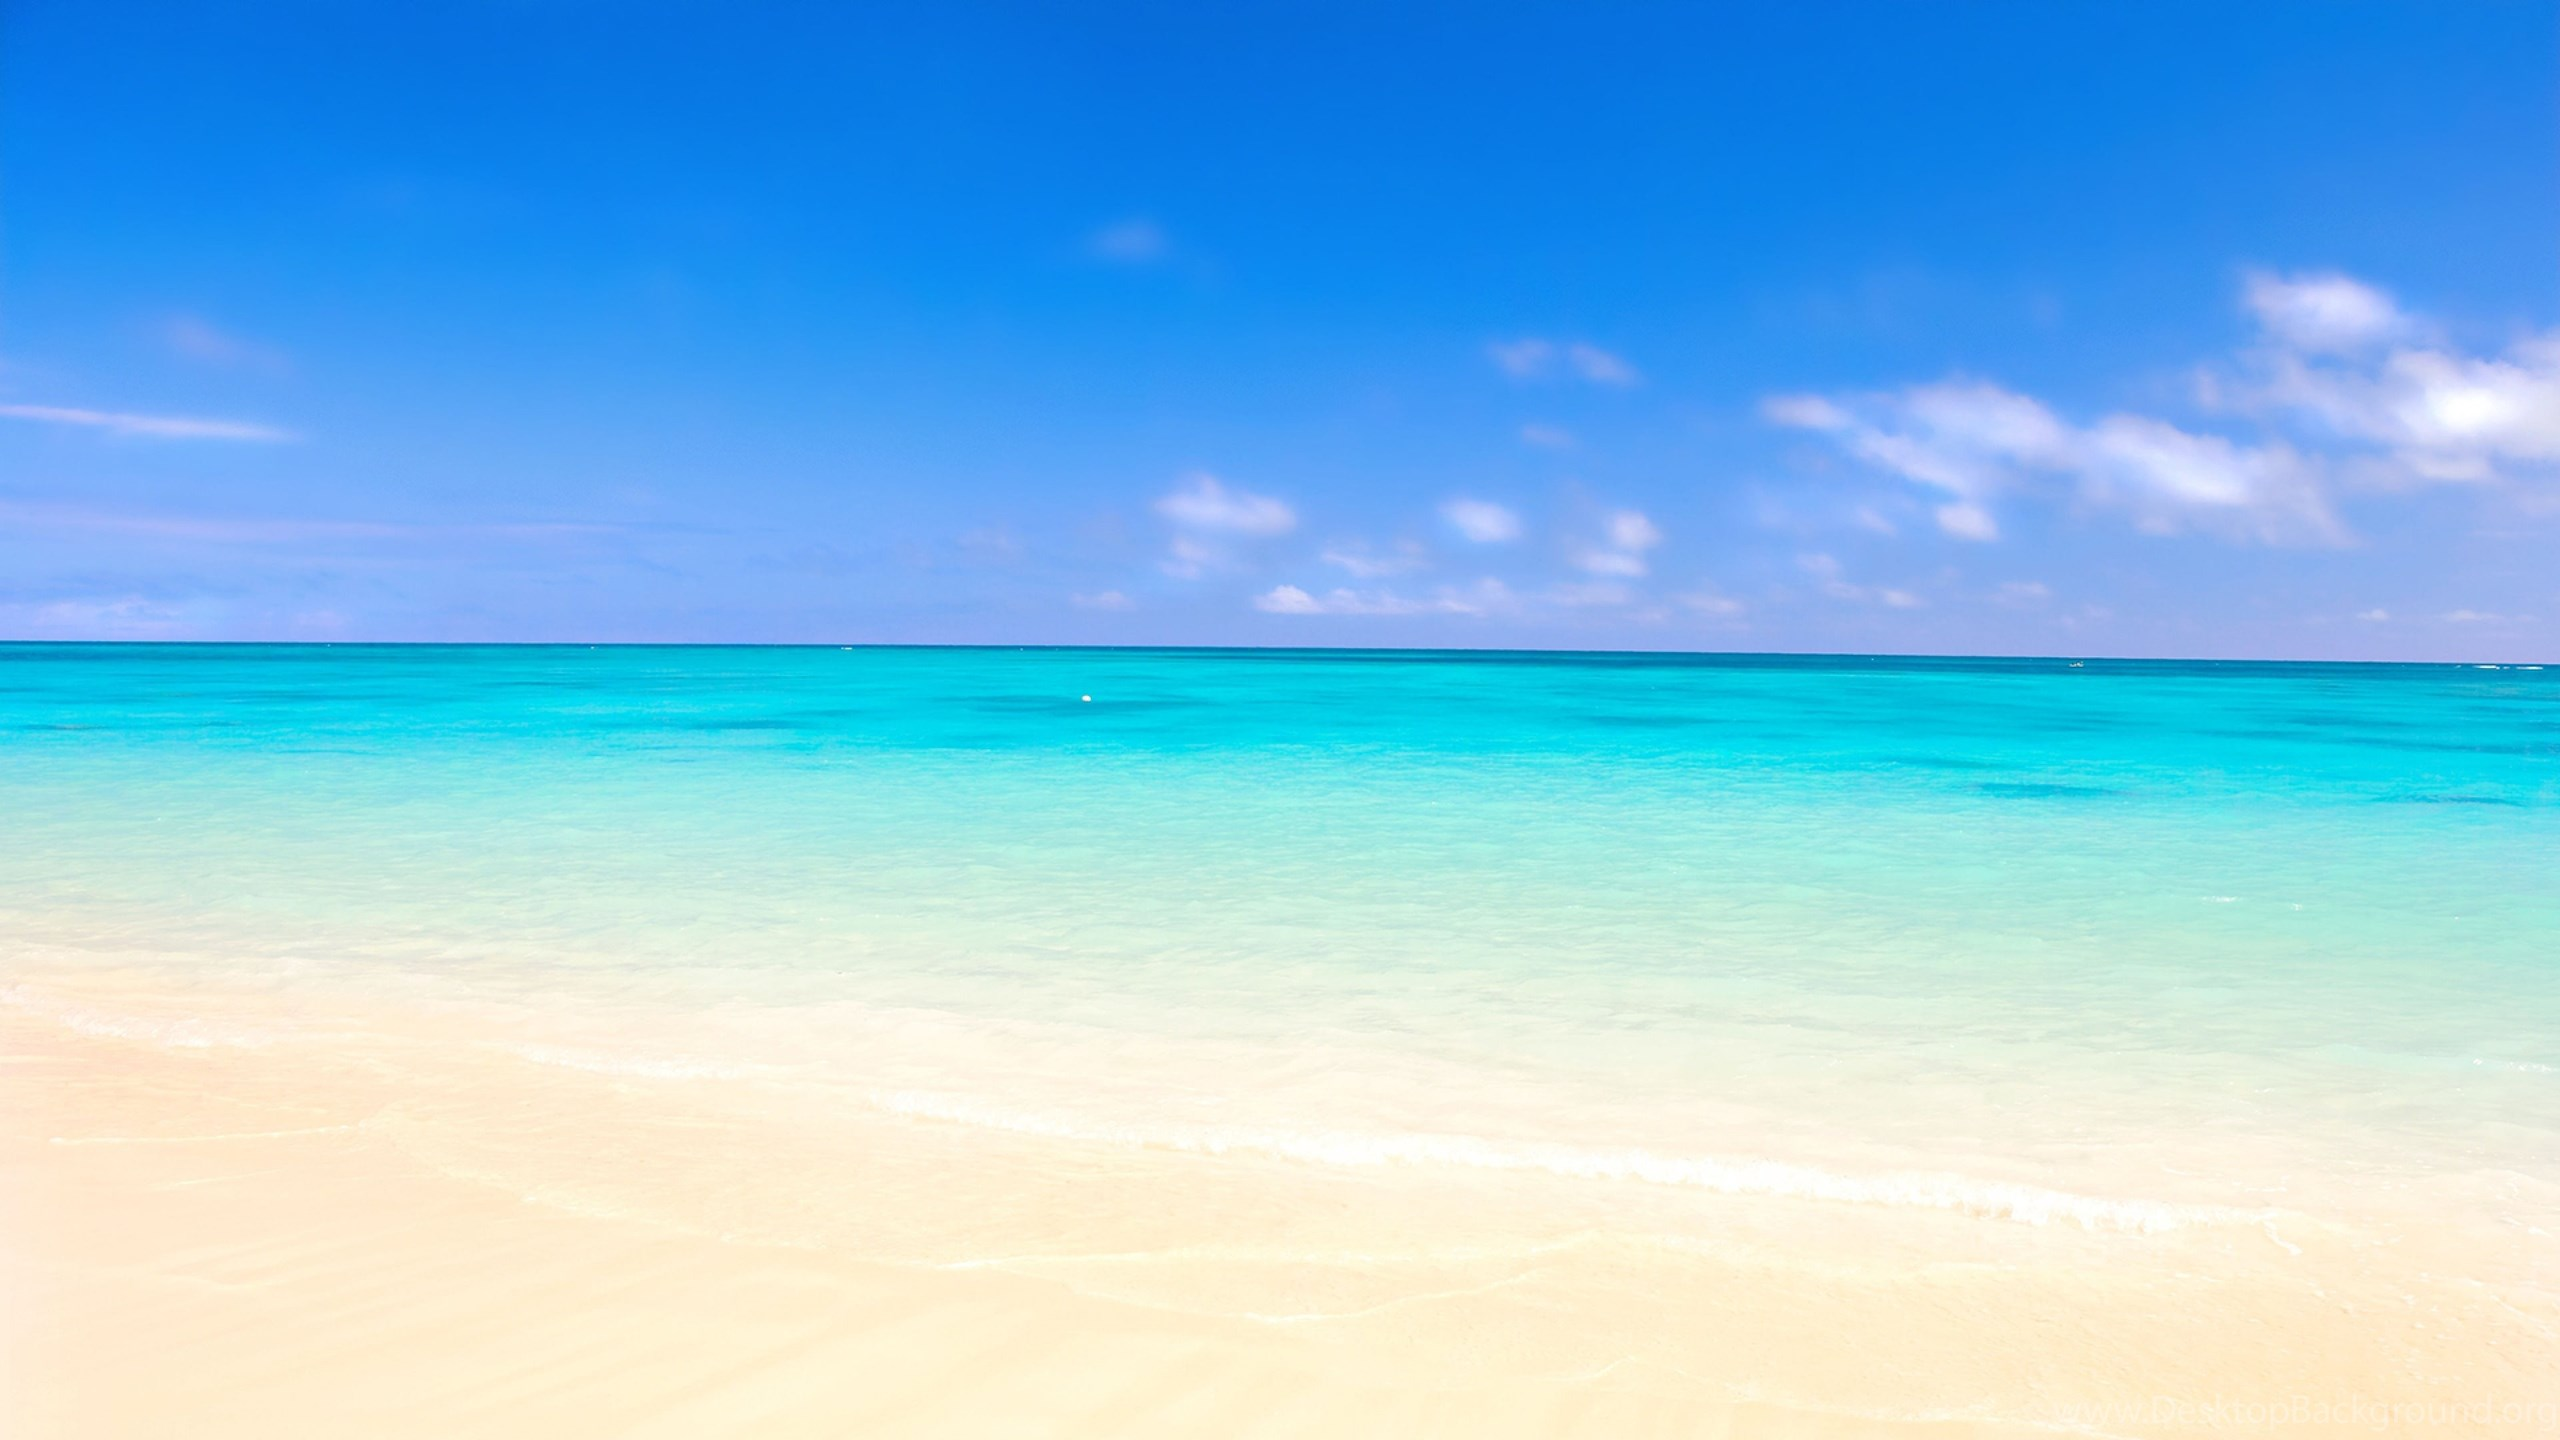 Download Wallpapers 3840x2160 Ocean Sand Beach 4k Ultra Hd Hd